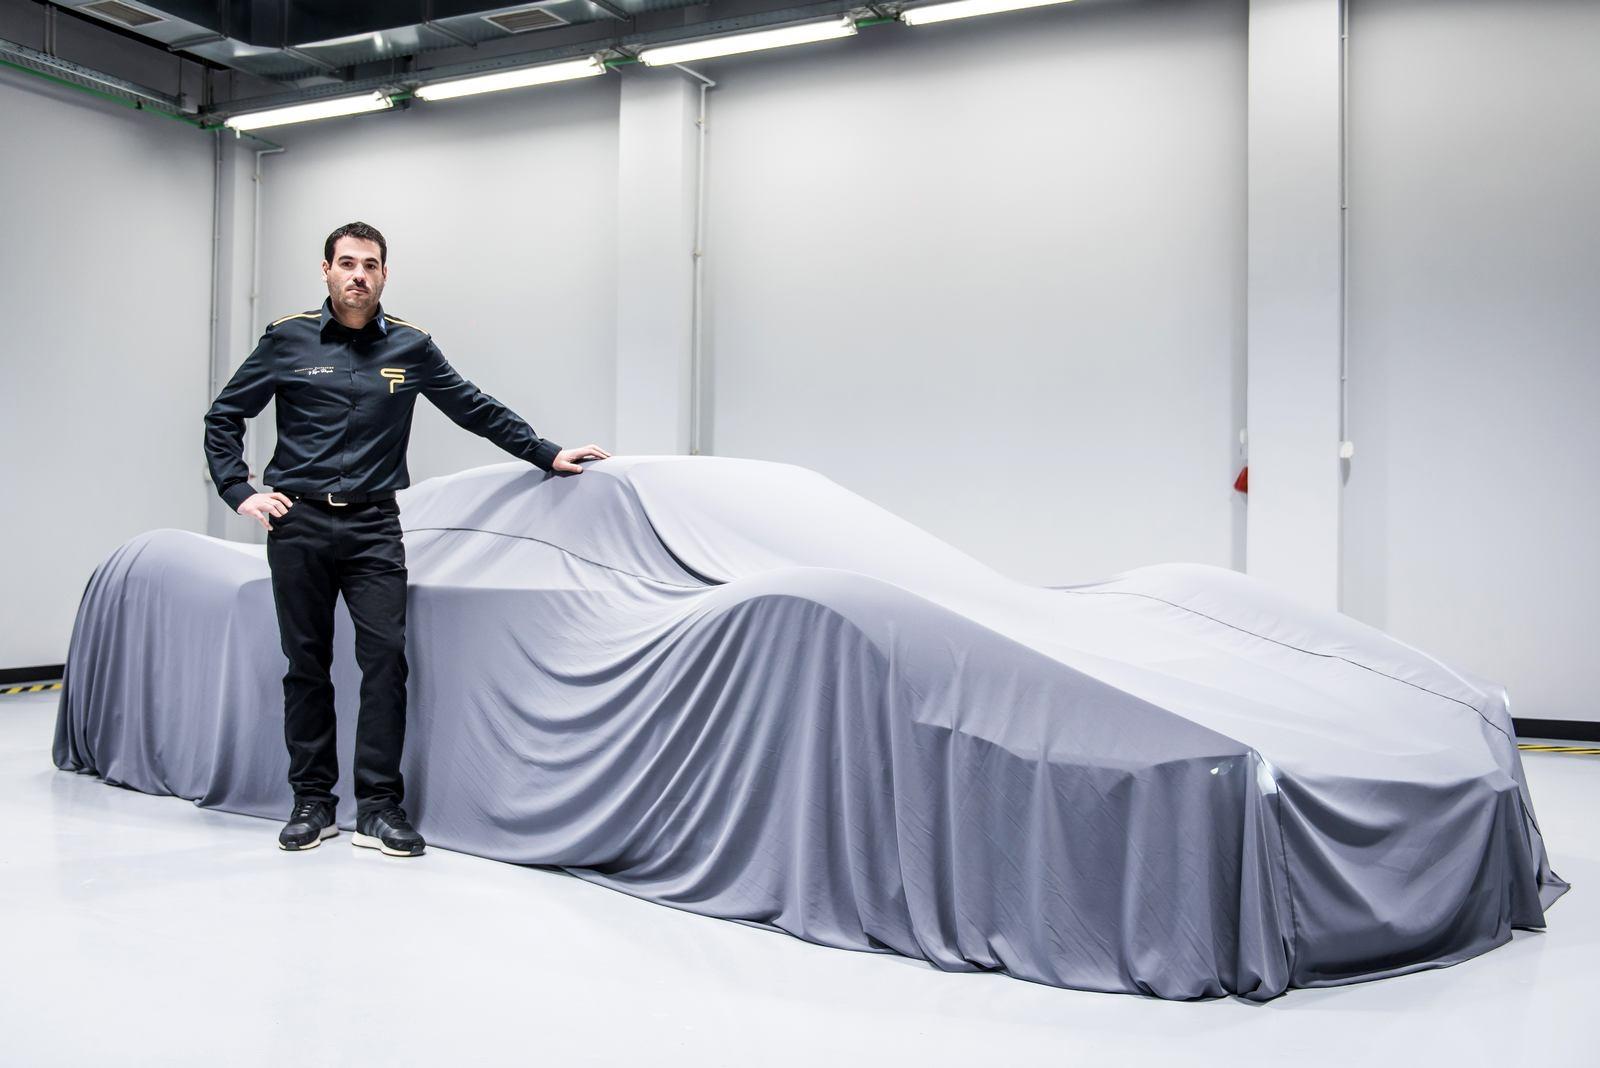 Spyros-Panopoulos-Automotive-Chaos-3